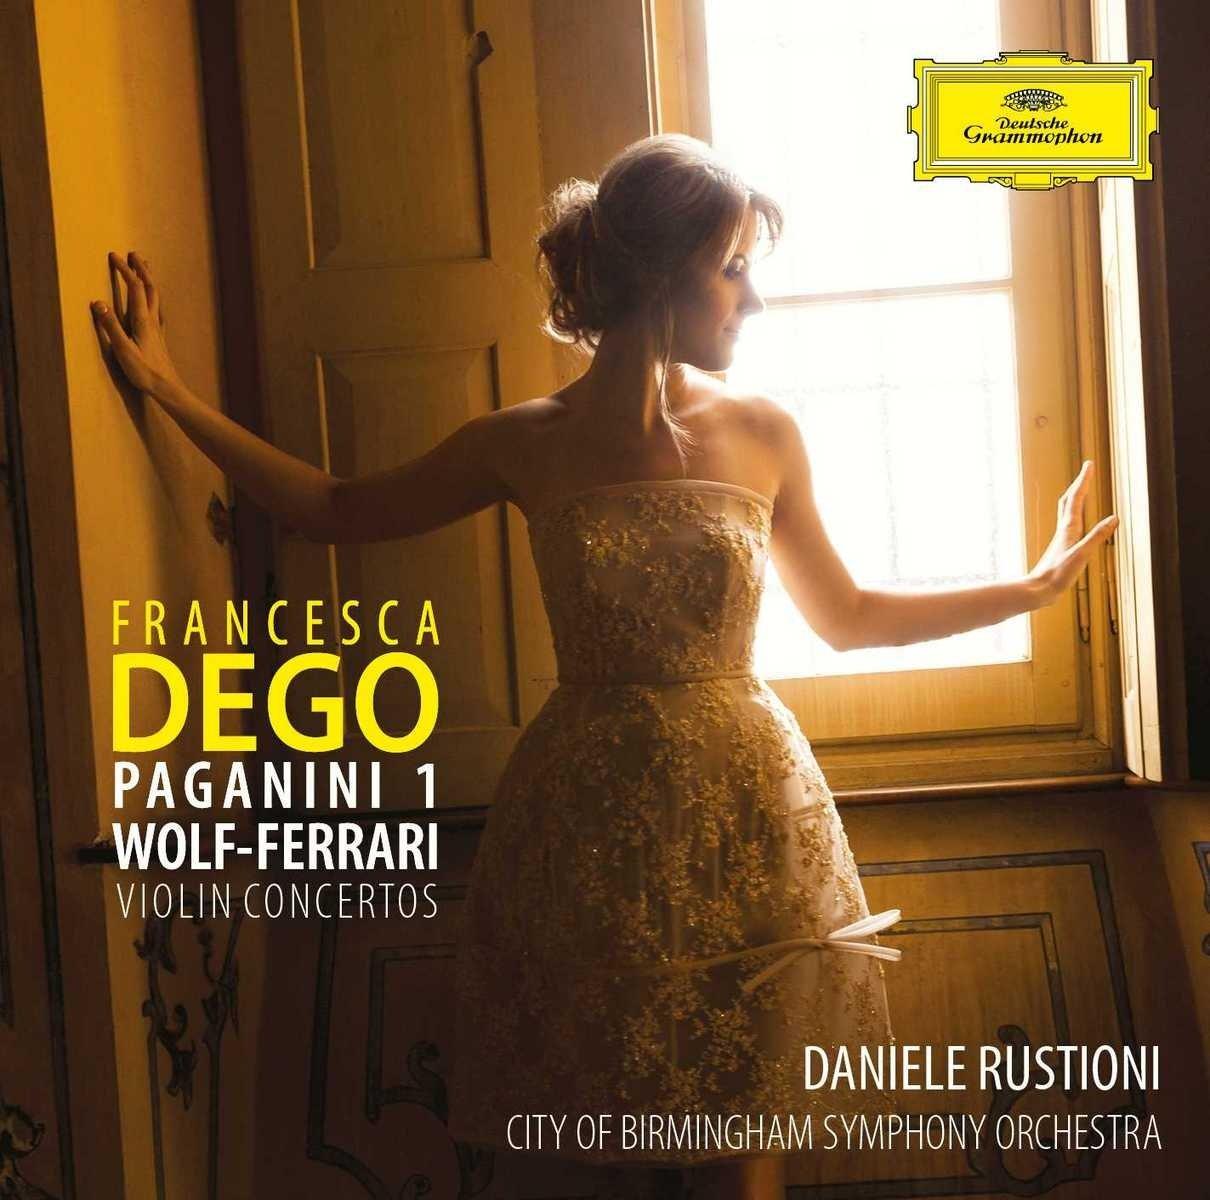 CD : Francesca Dego - Paganini 1 Wolf-ferrari Violin Concertos (CD)